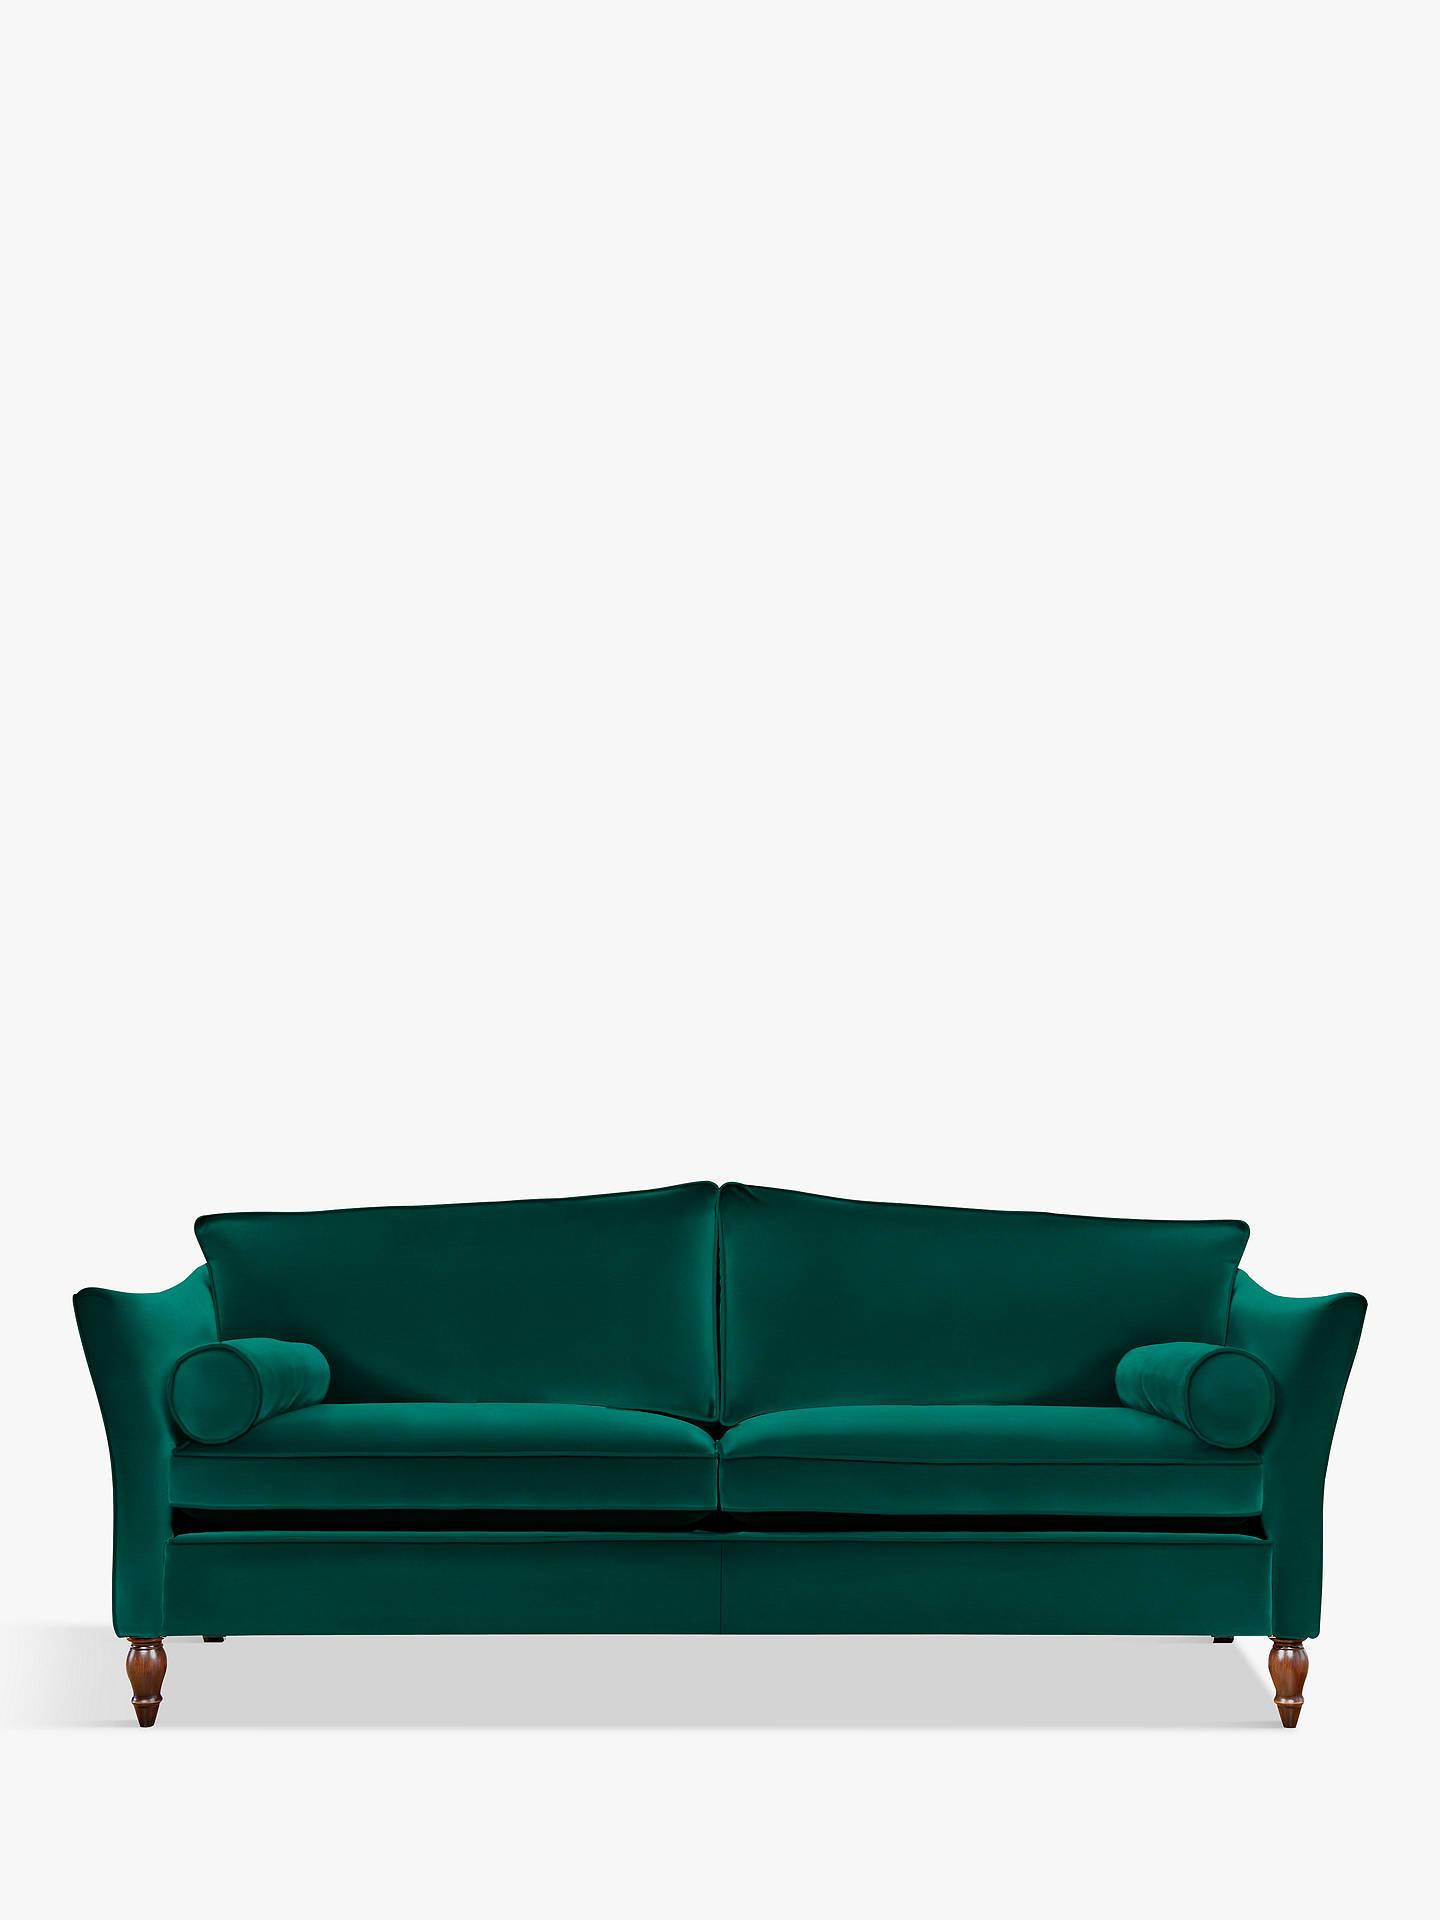 Buyduresta vaughan grand 4 seater sofa umber leg harrow velvet teal green online at